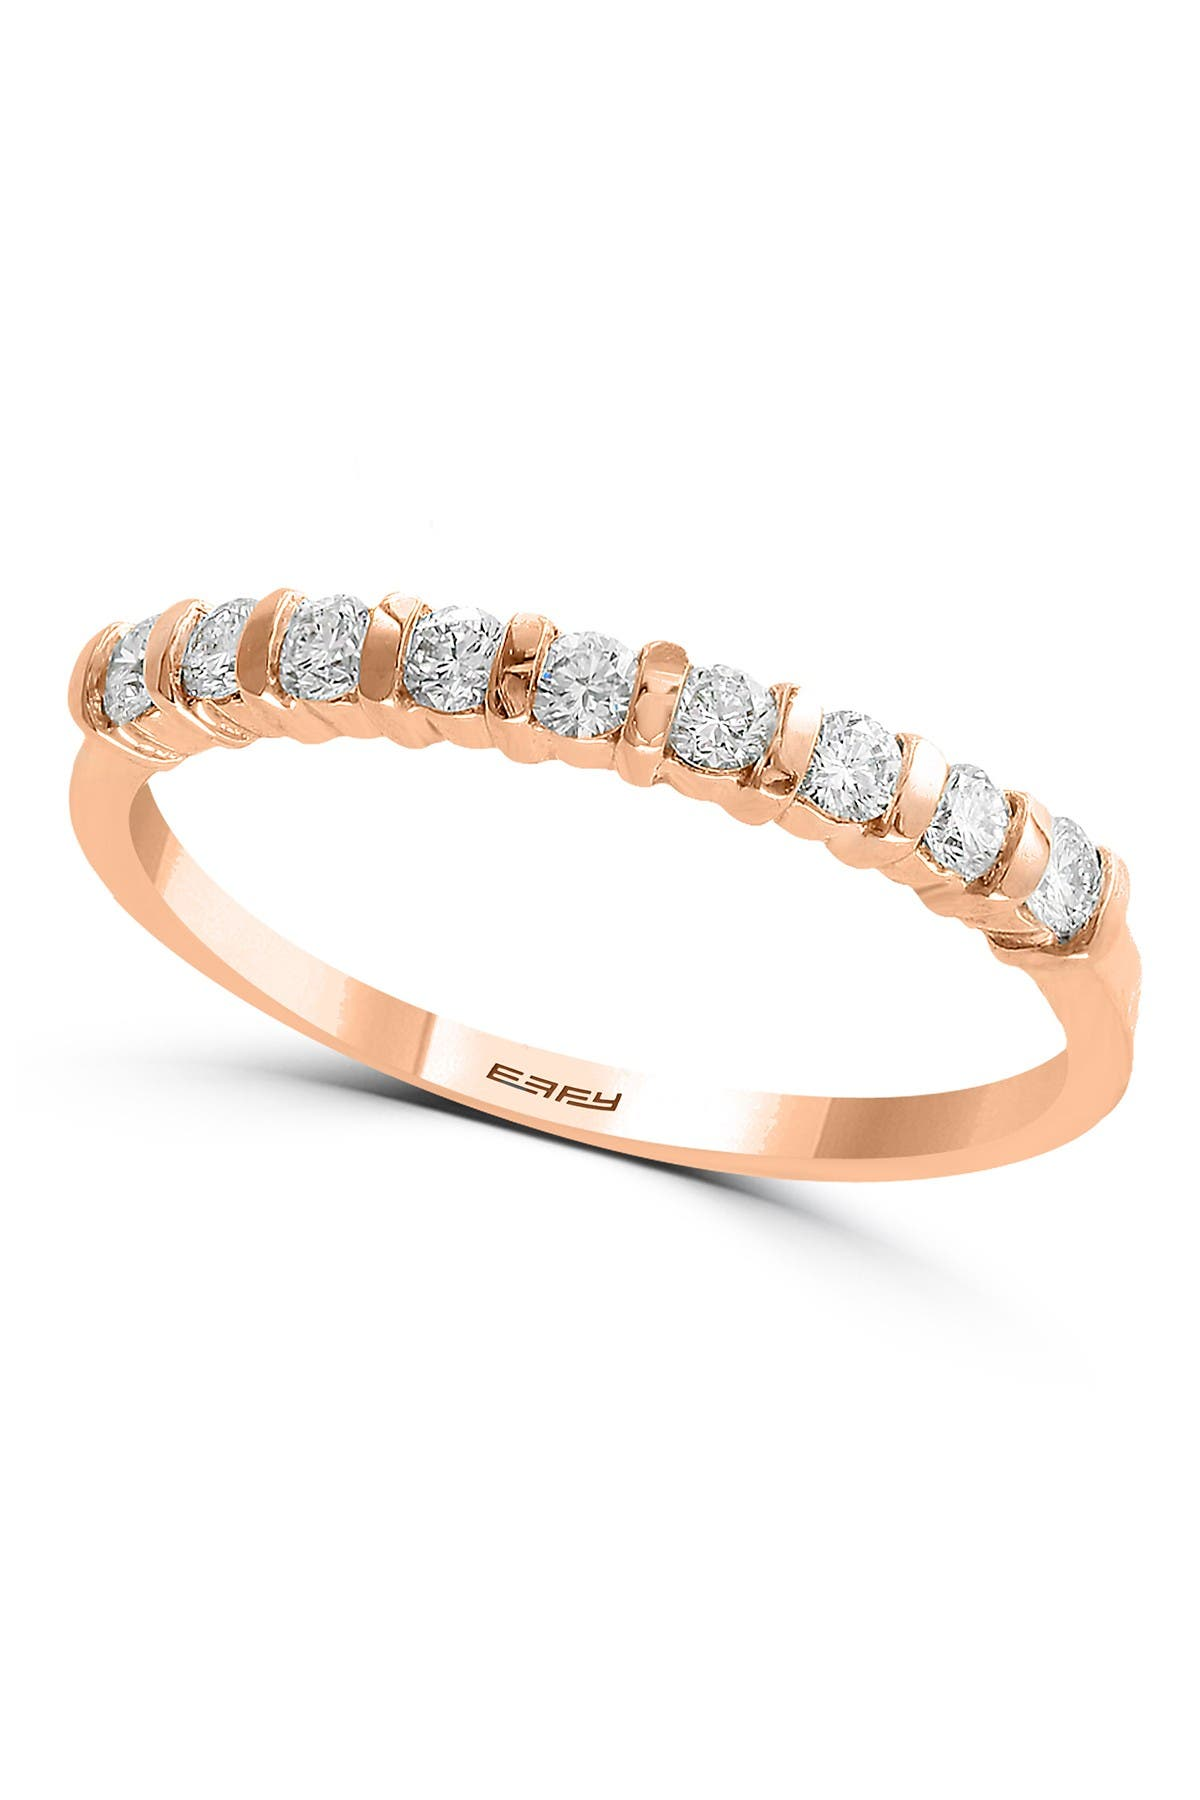 Image of Effy 14K Rose Gold Diamond Ring - 0.26 ctw - Size 7